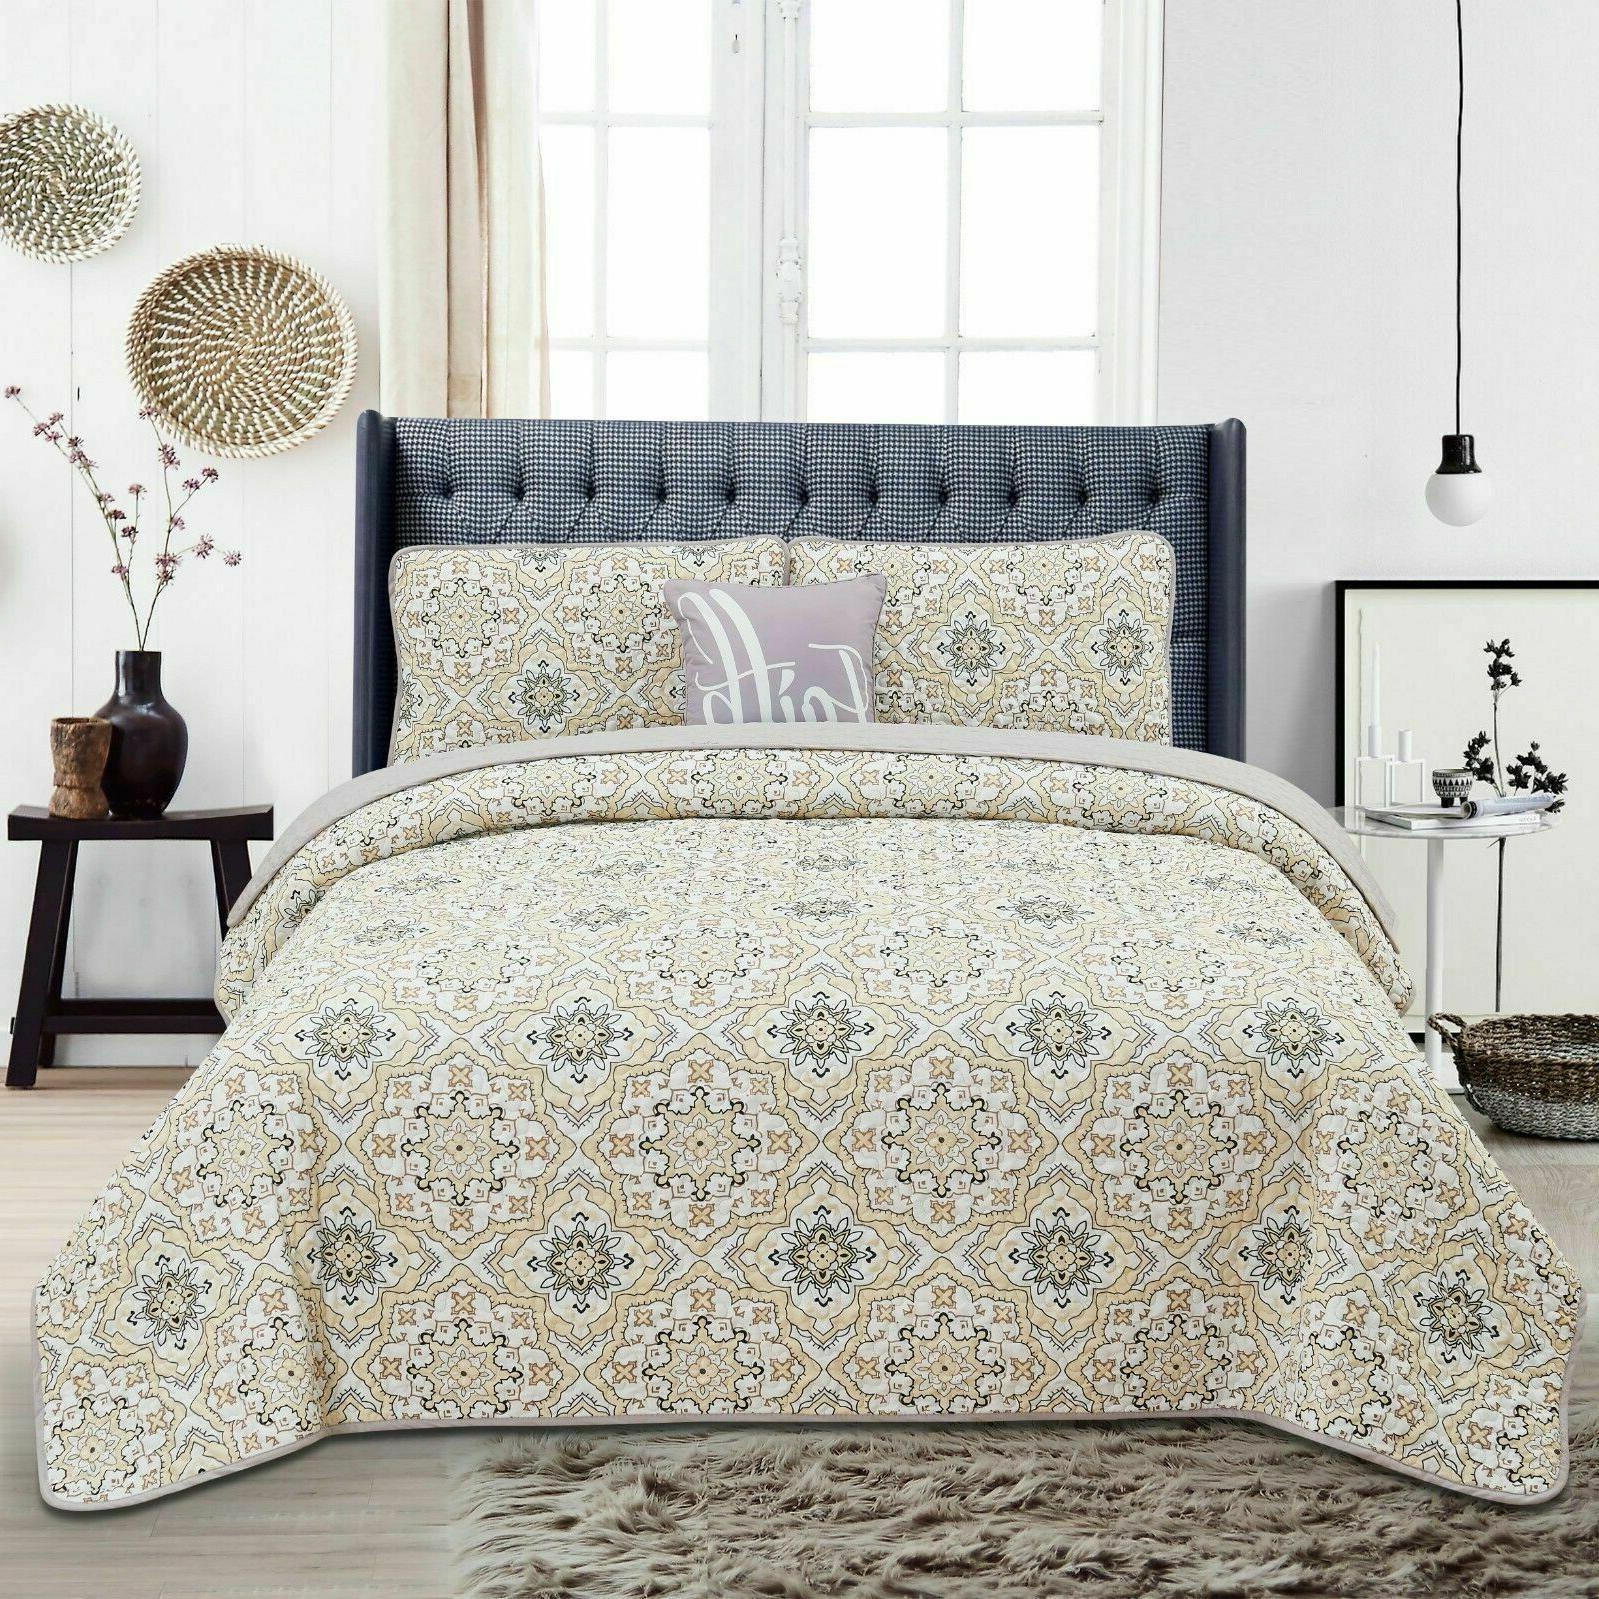 Queen Quilt Bedding Printed Quilt Set King Bedding Set